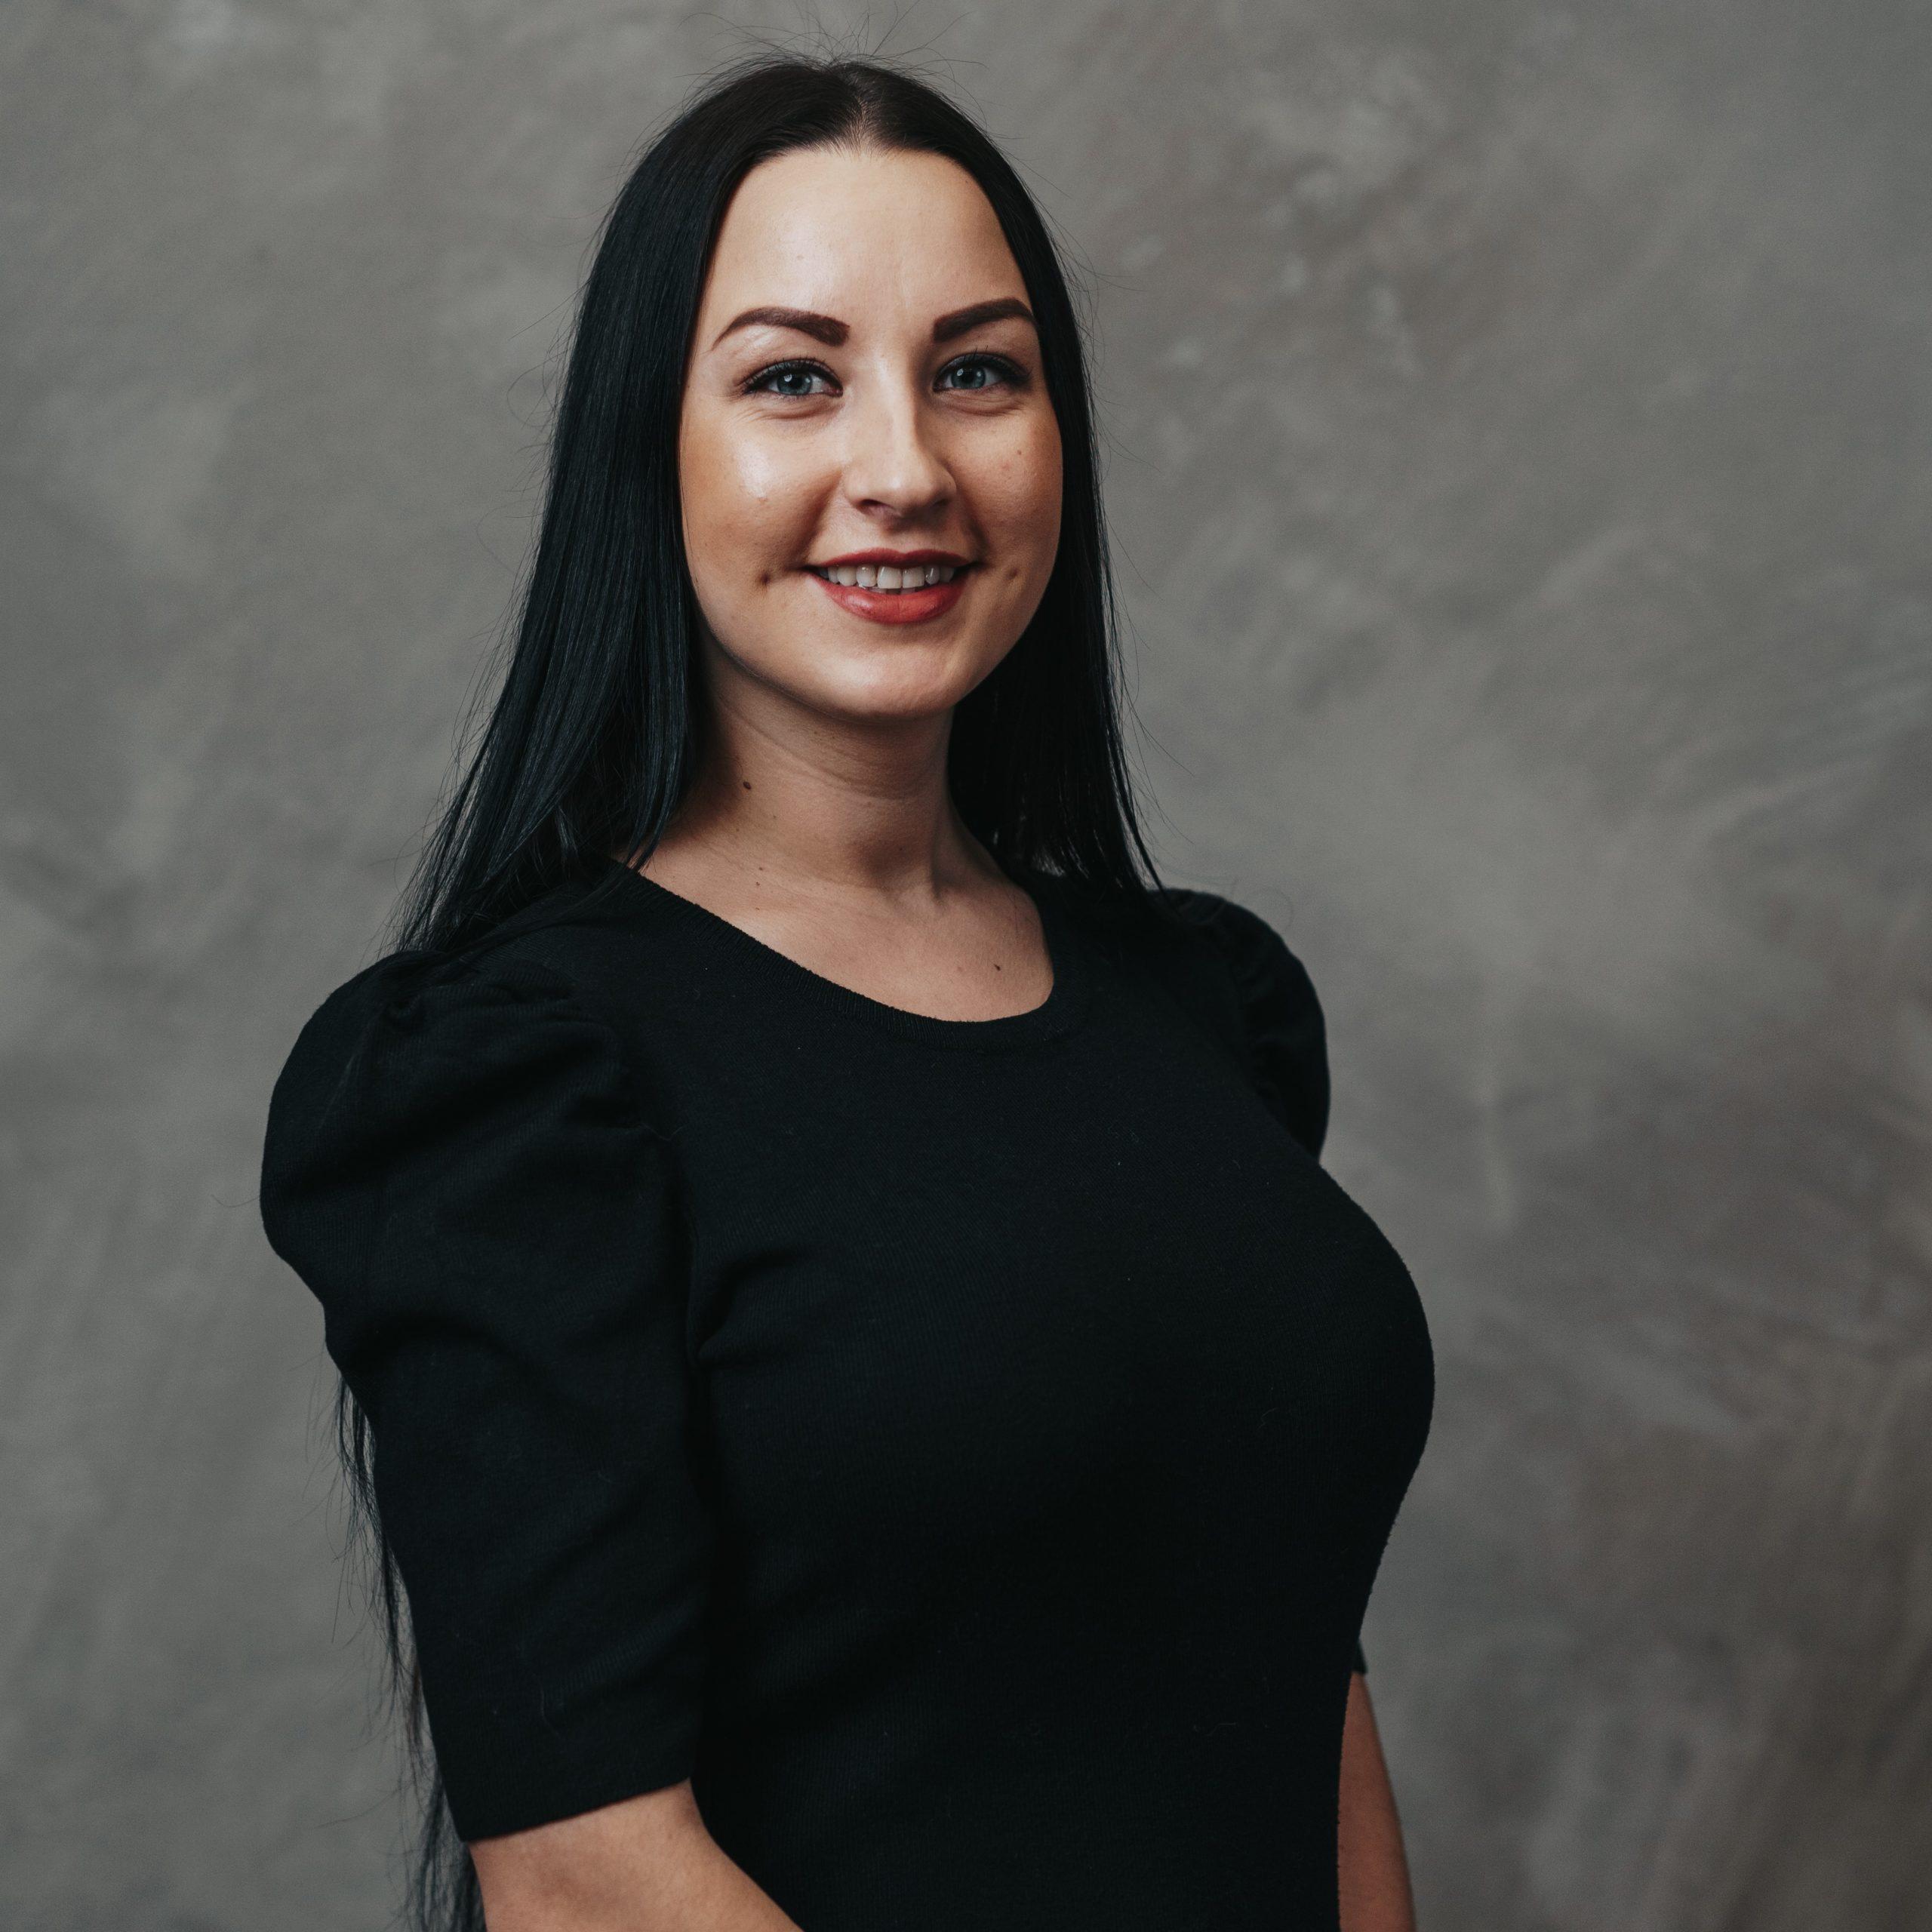 Valentina Bortnovski